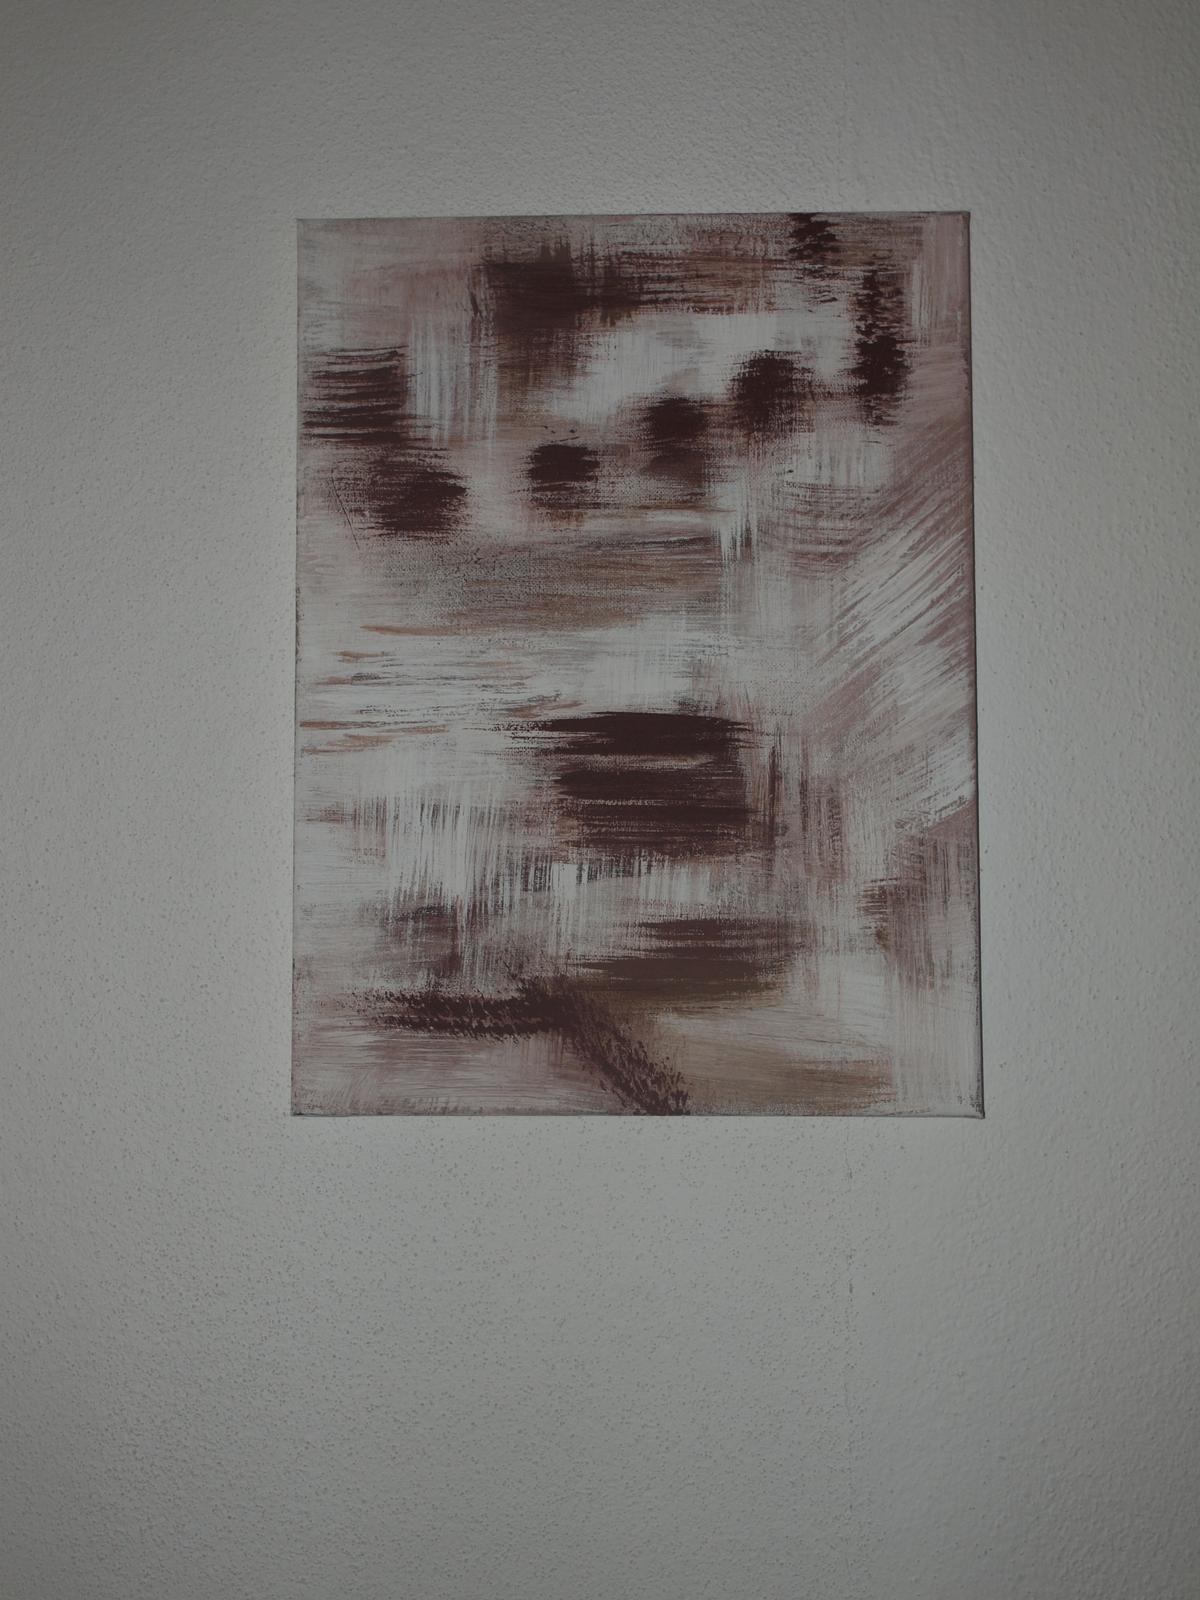 Dekorace -hledám, tvořím - Obrázek č. 7